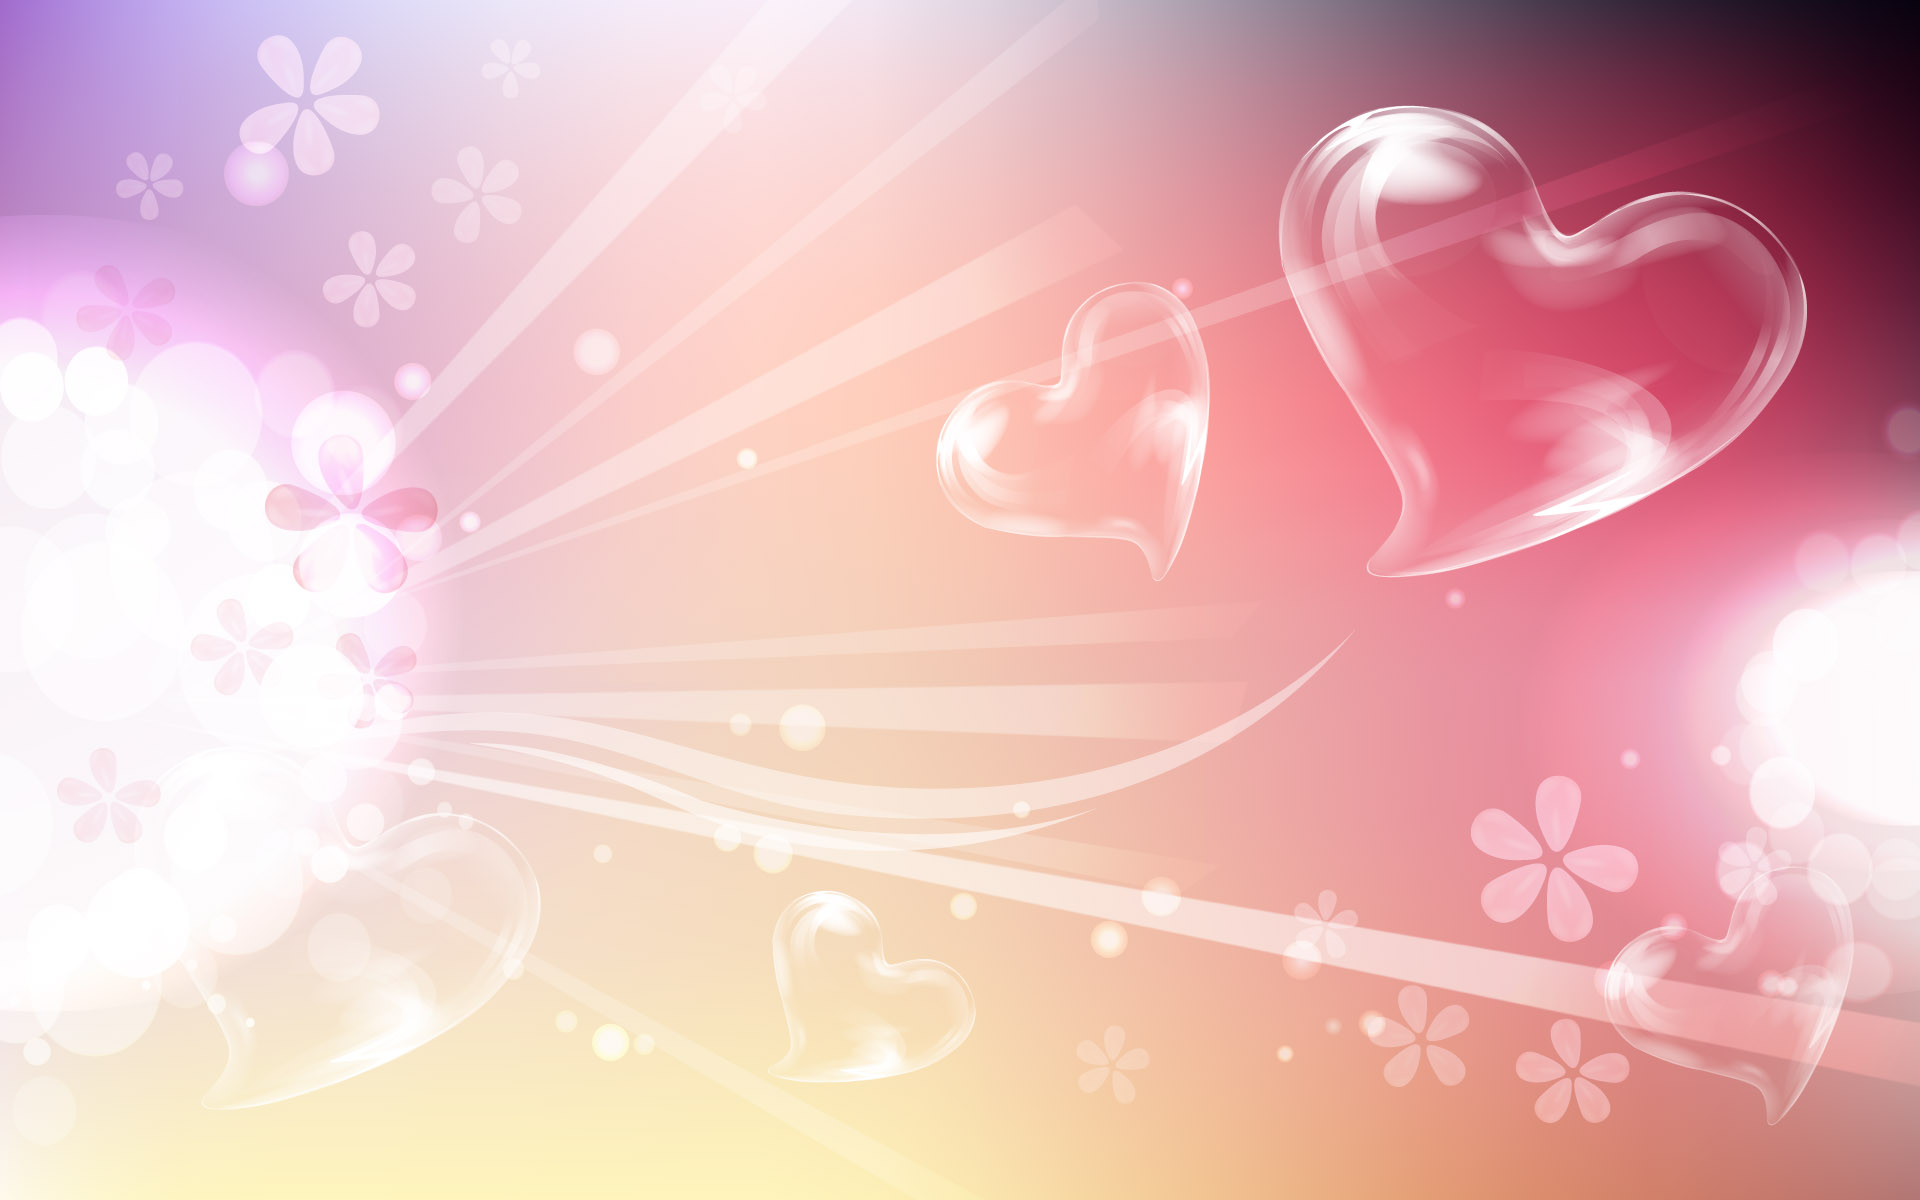 Background Love wallpaper   380466 1920x1200